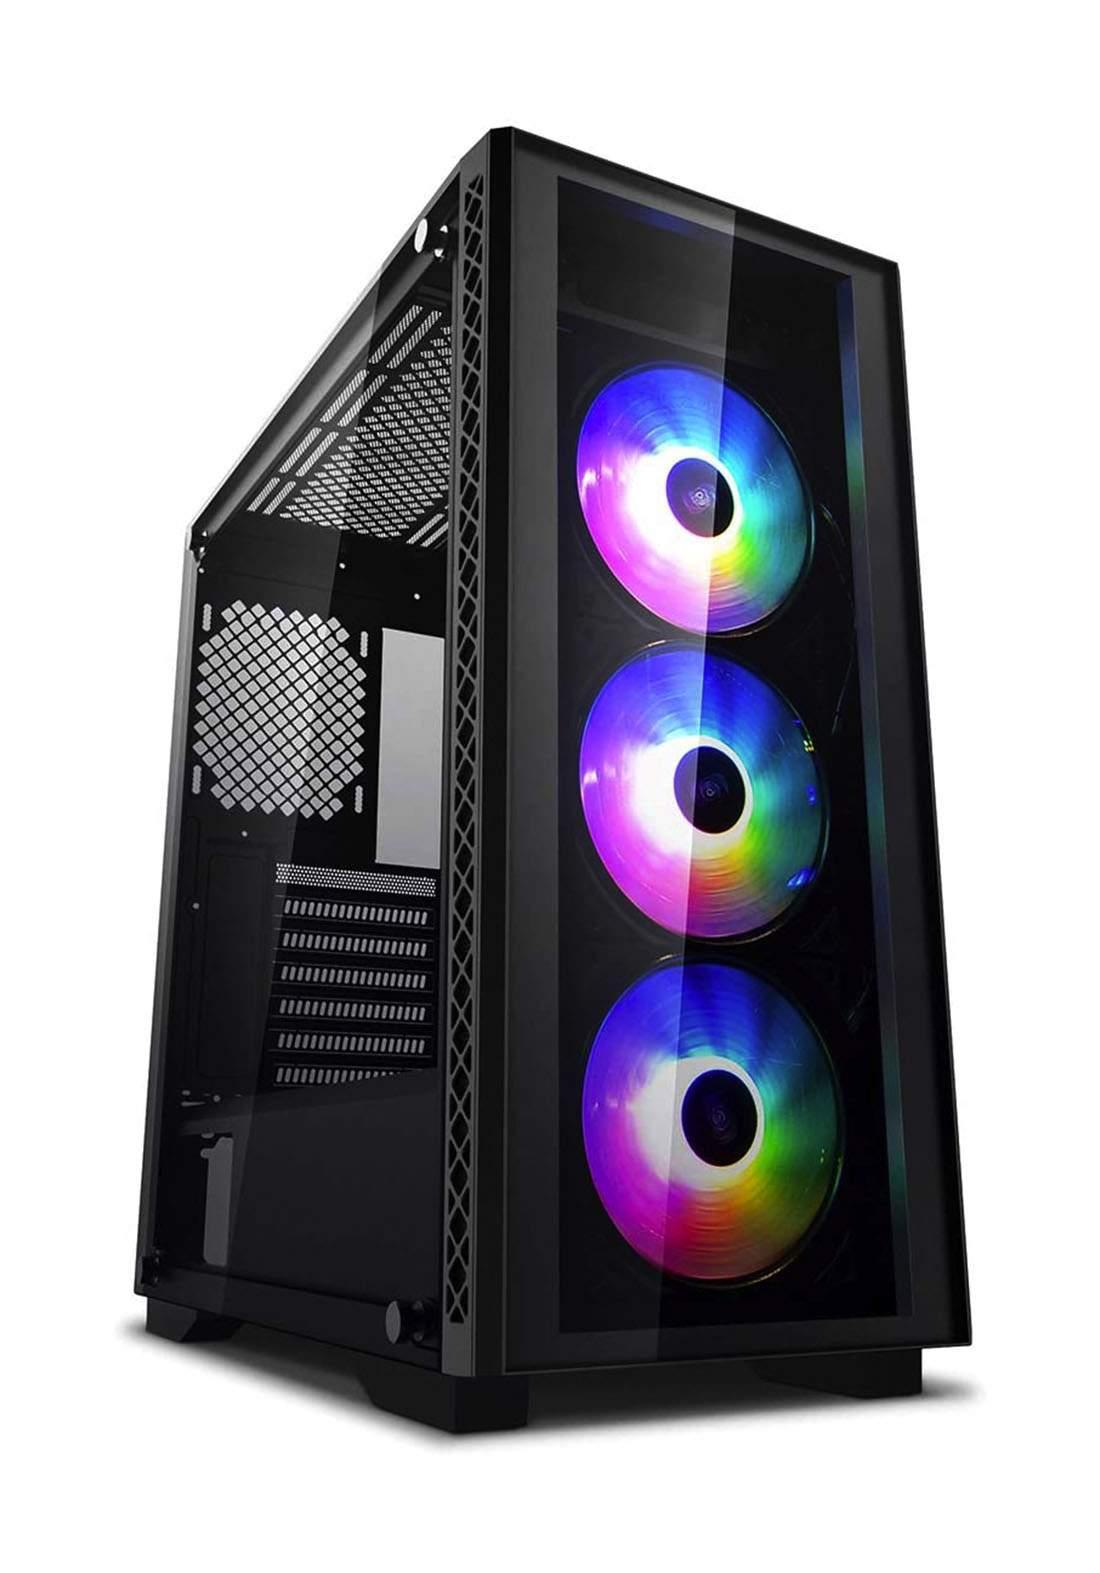 Deepcool Matrexx 50 Atx Mid Tower Case - Black  كيس حاسبة